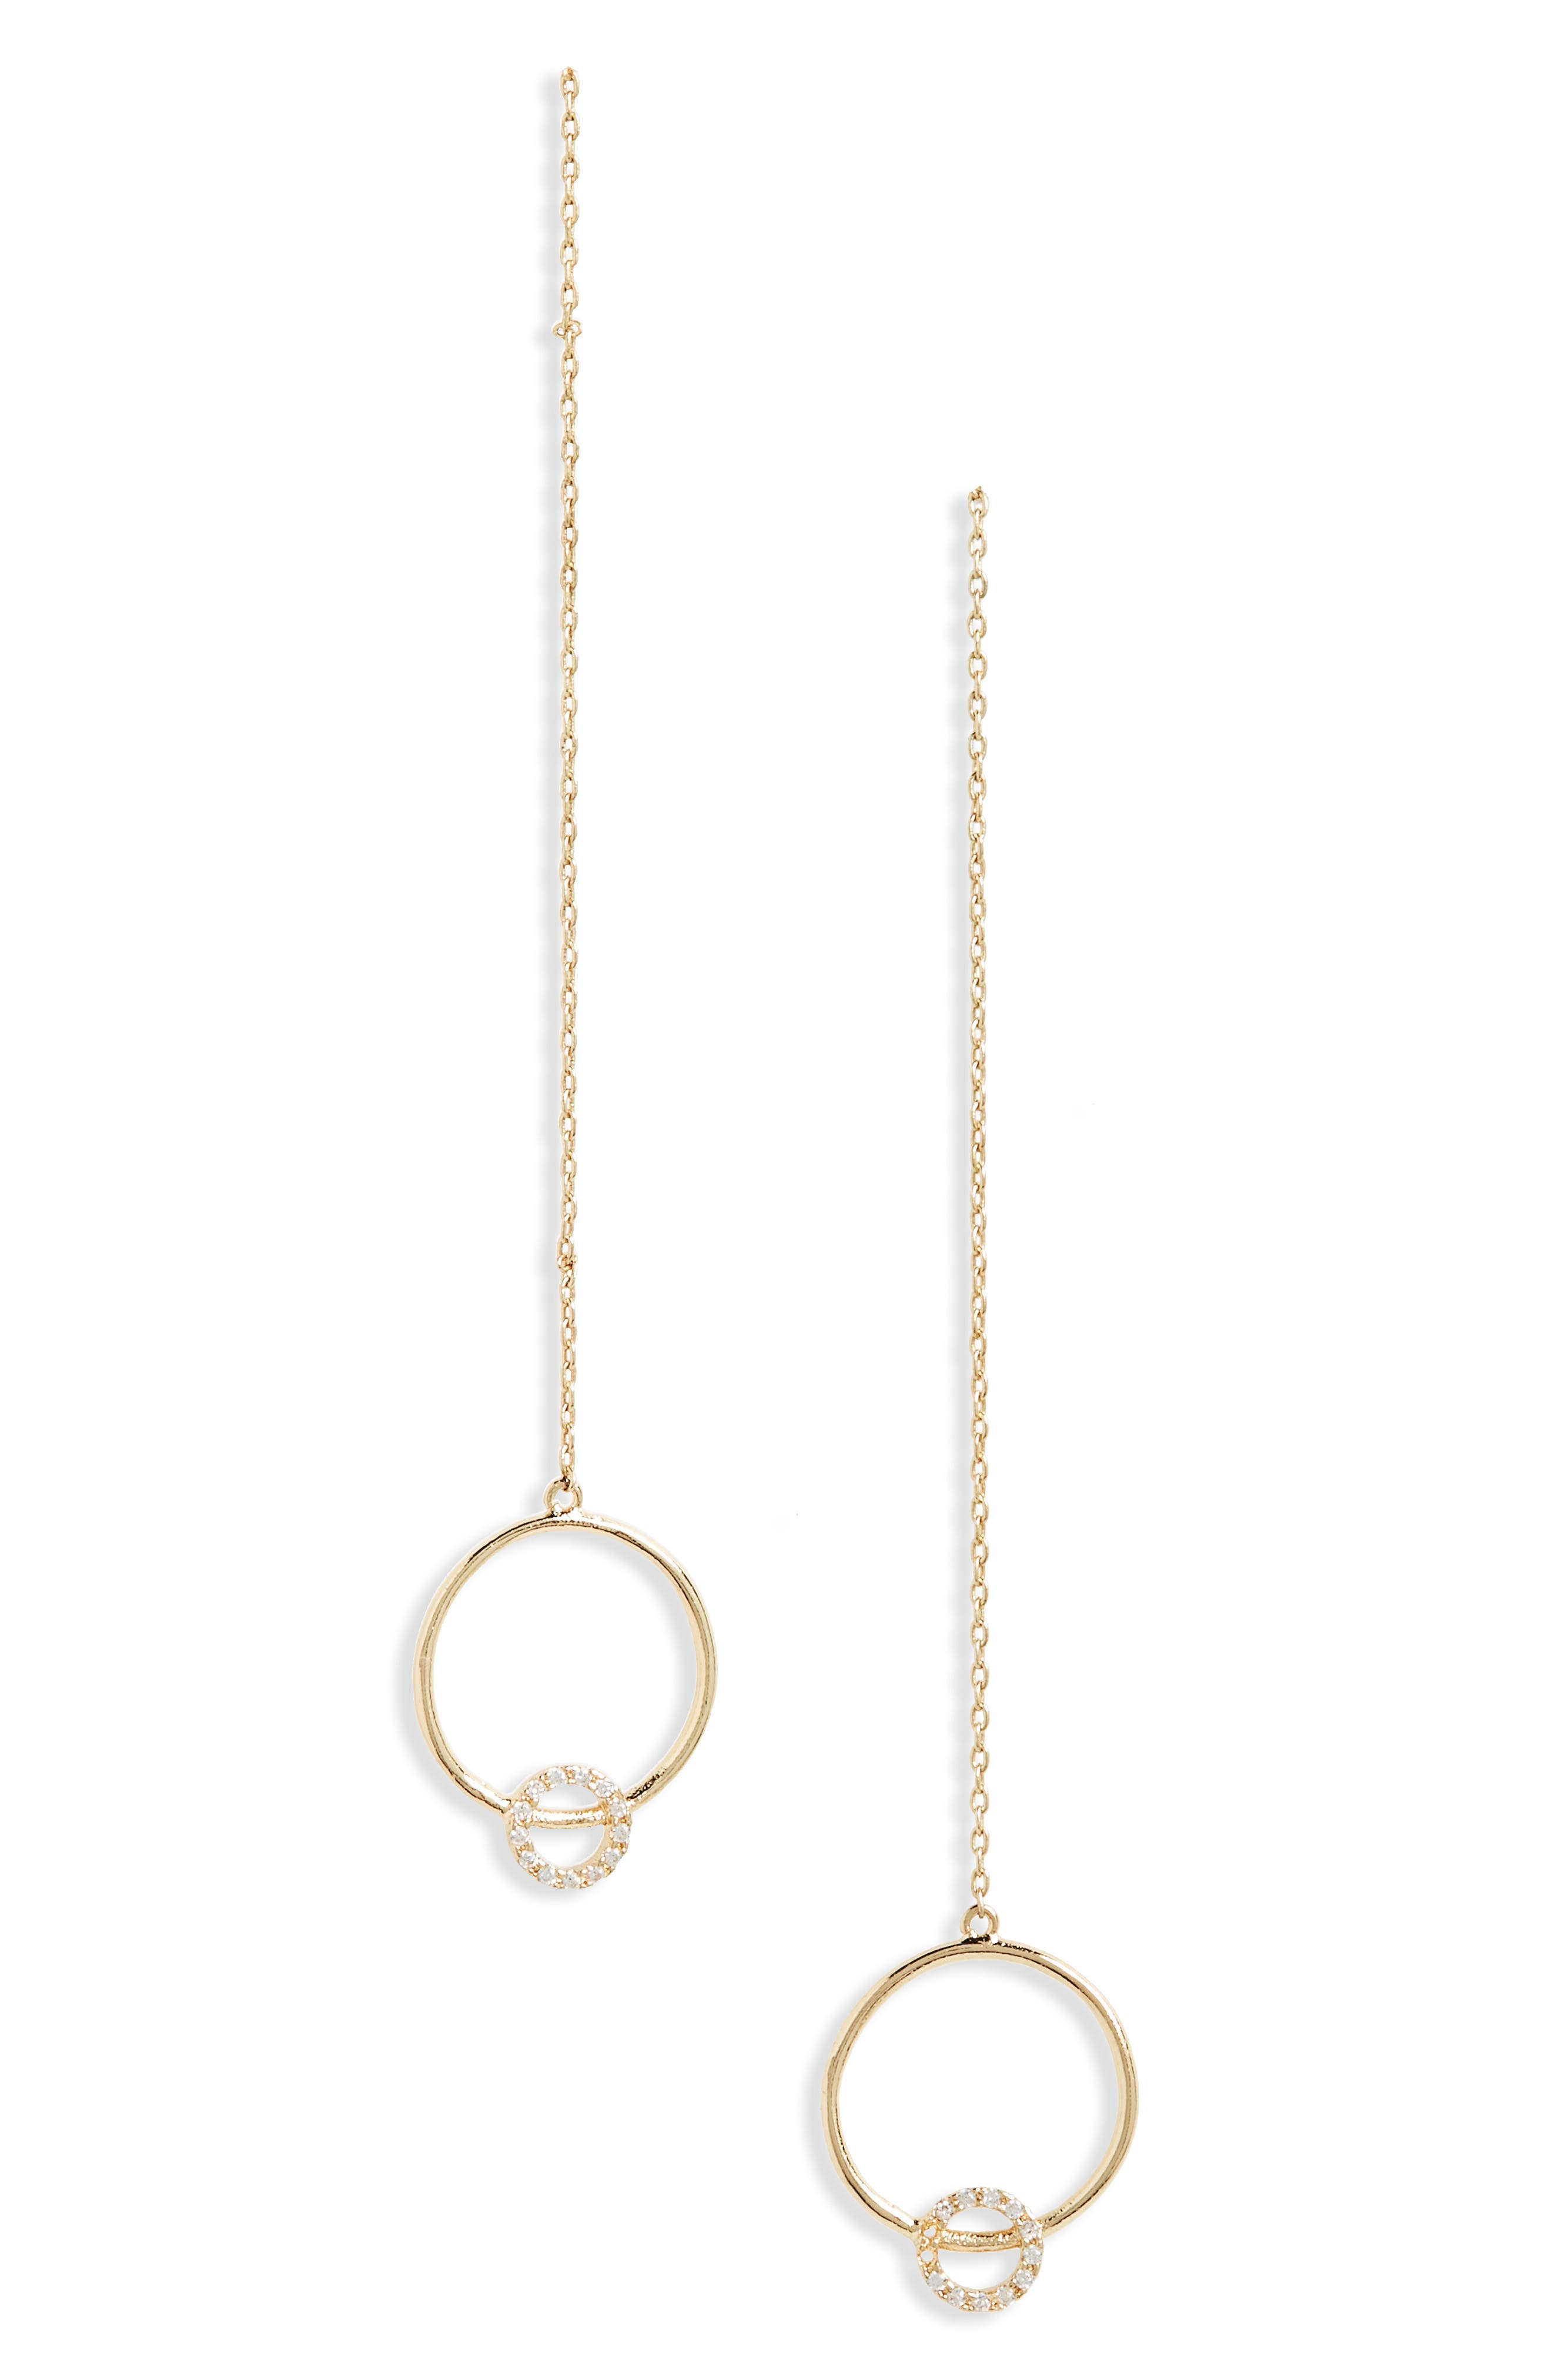 Crystal Circle Drop Earrings,                         Main,                         color, Gold